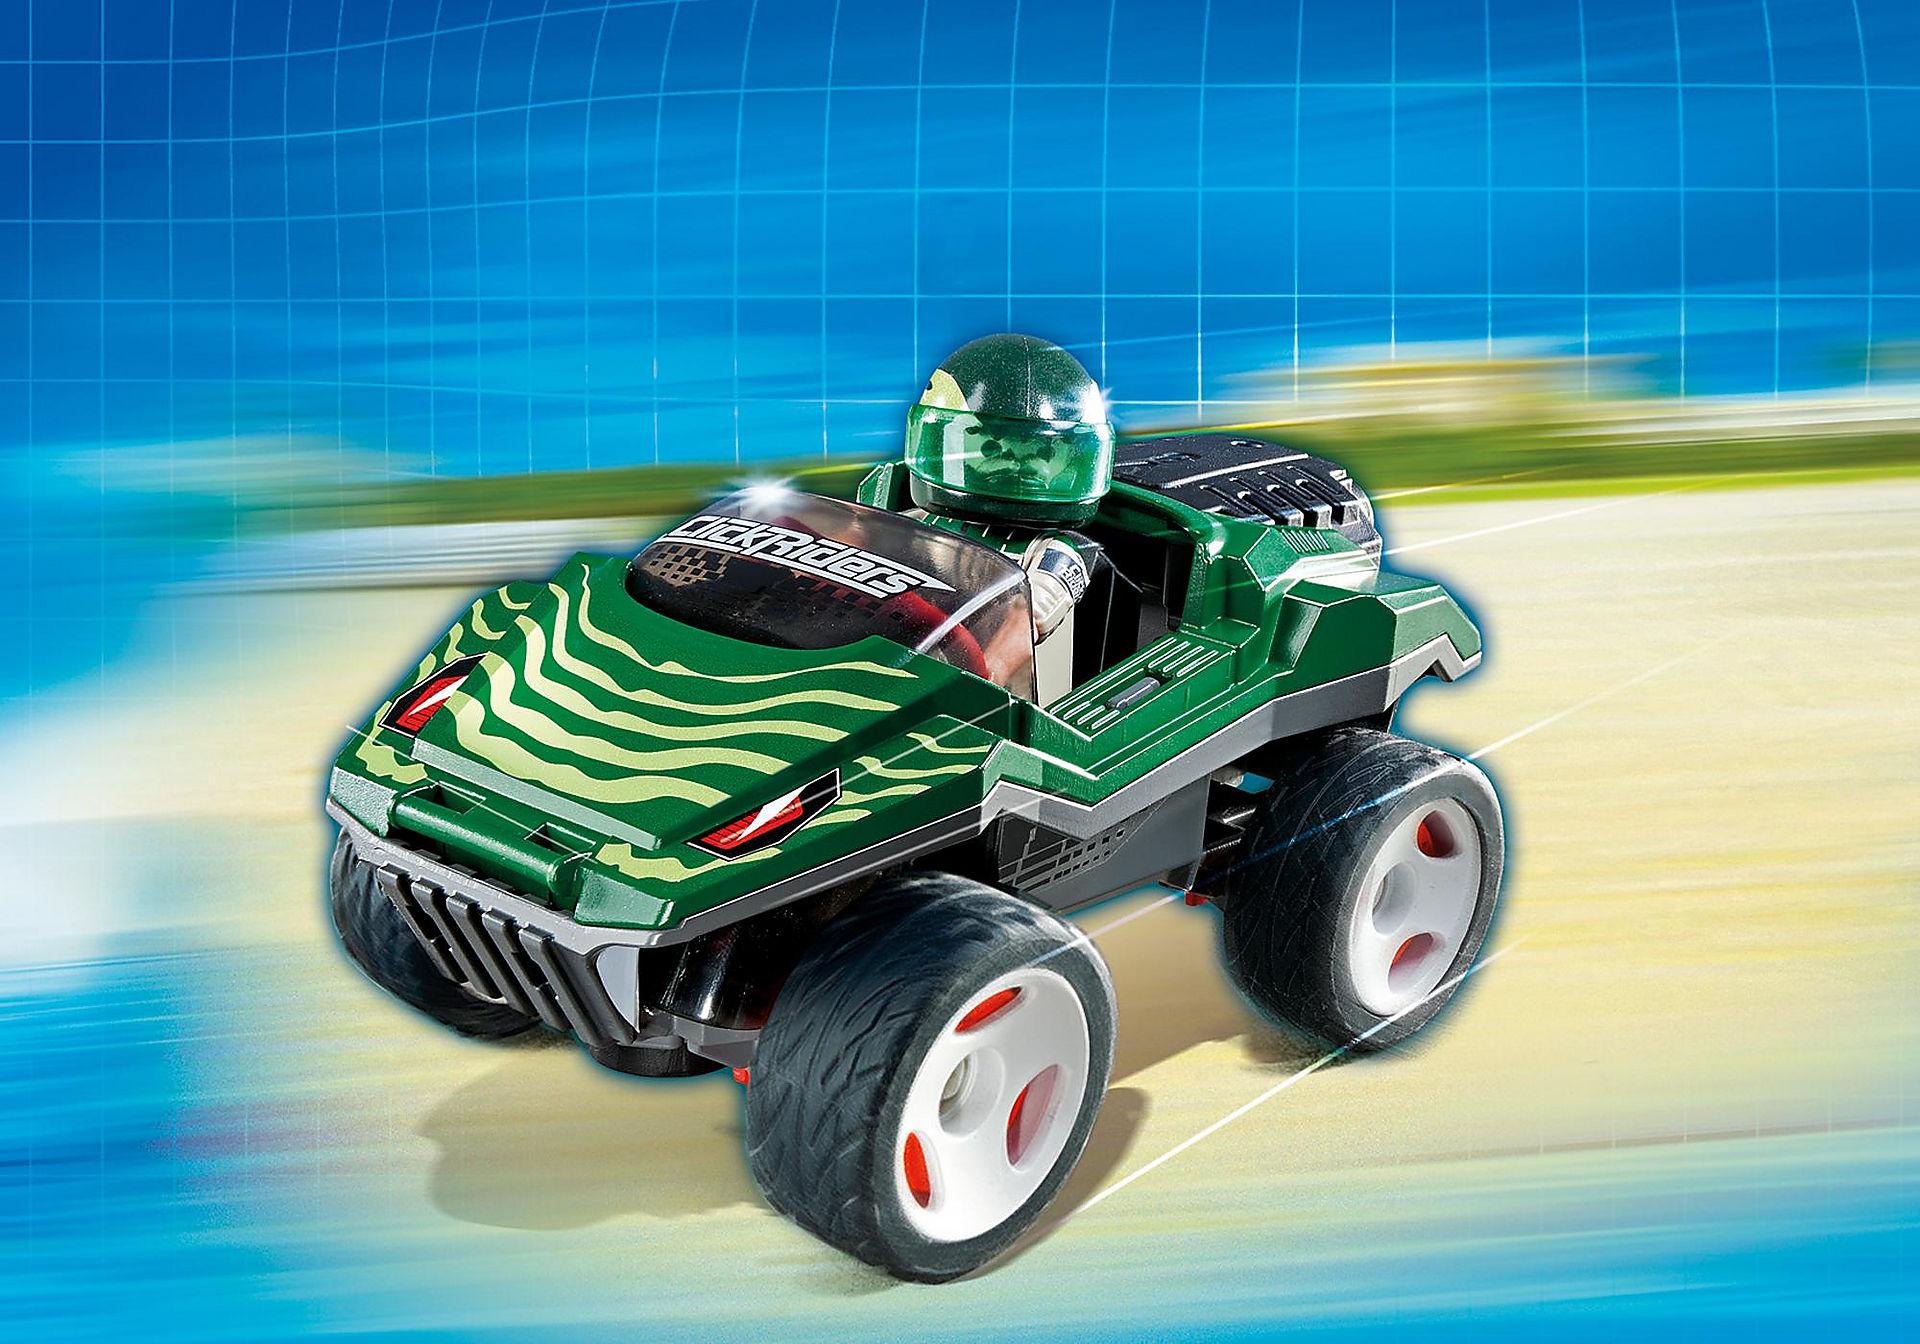 5160 Click & Go Snake Racer zoom image1